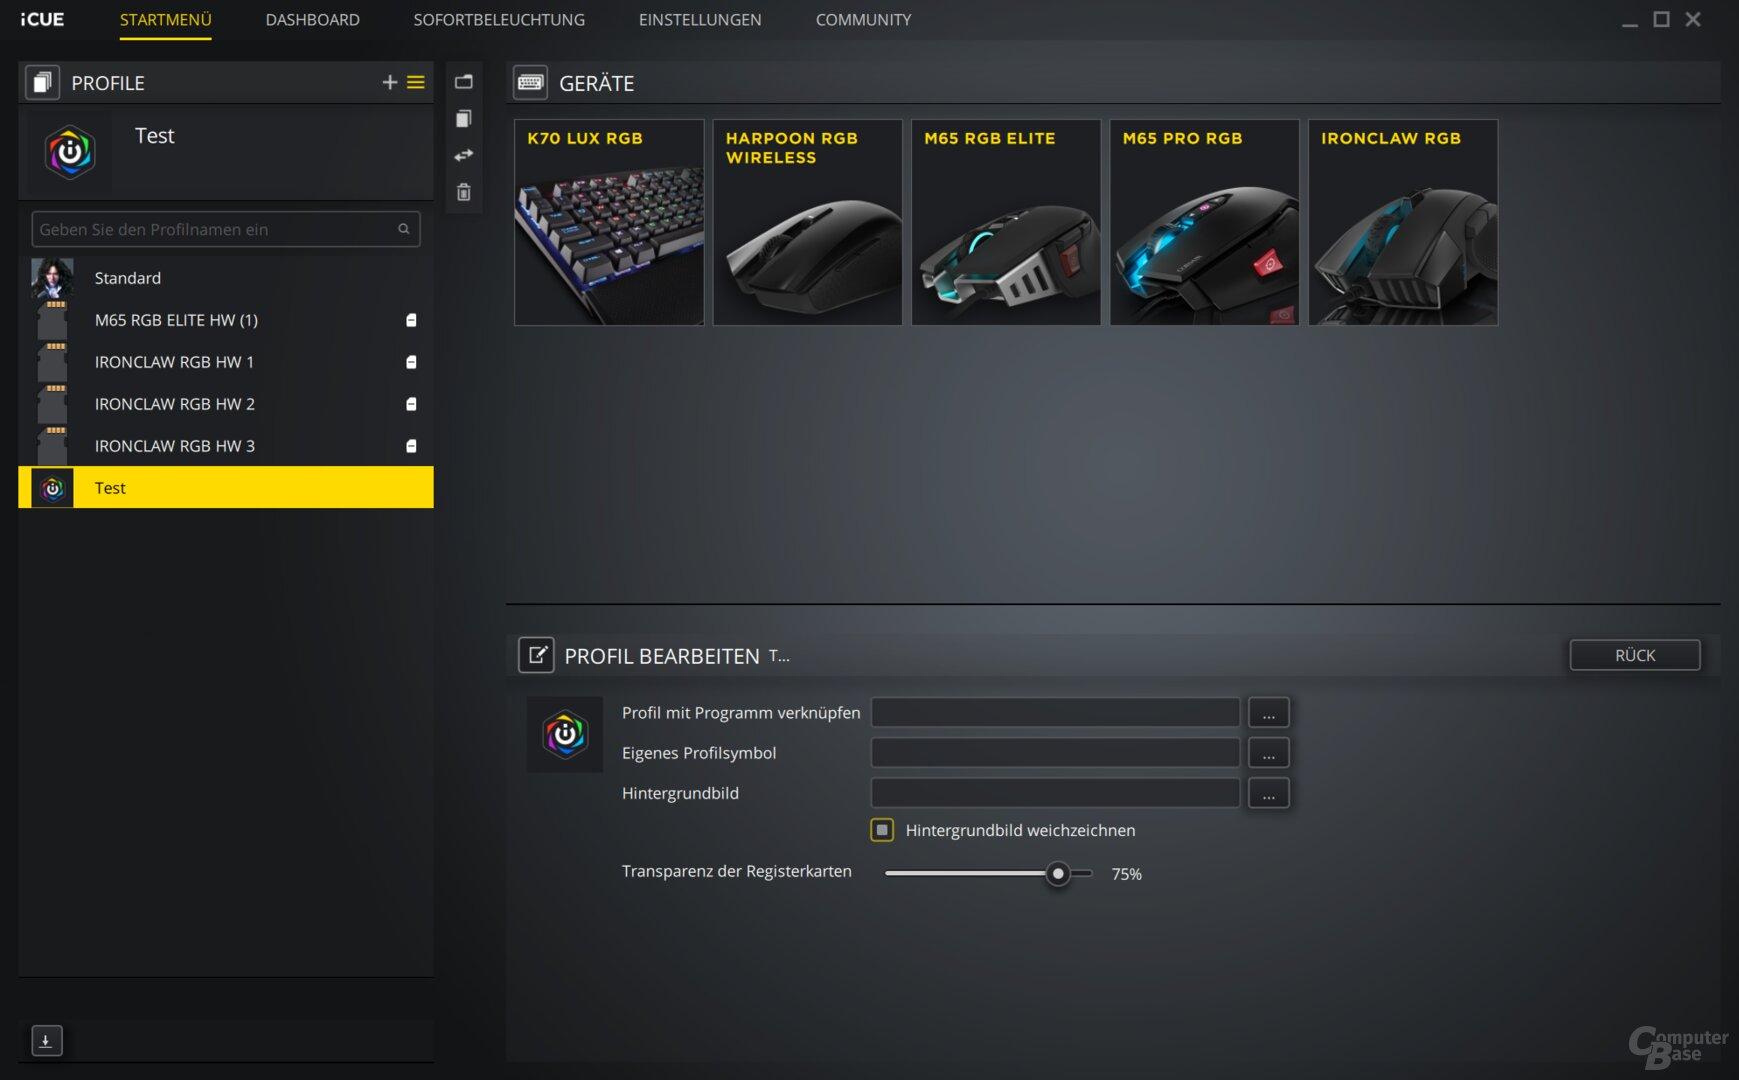 Per iCue lassen sich nahezu alle Corsair-Komponenten verwalten